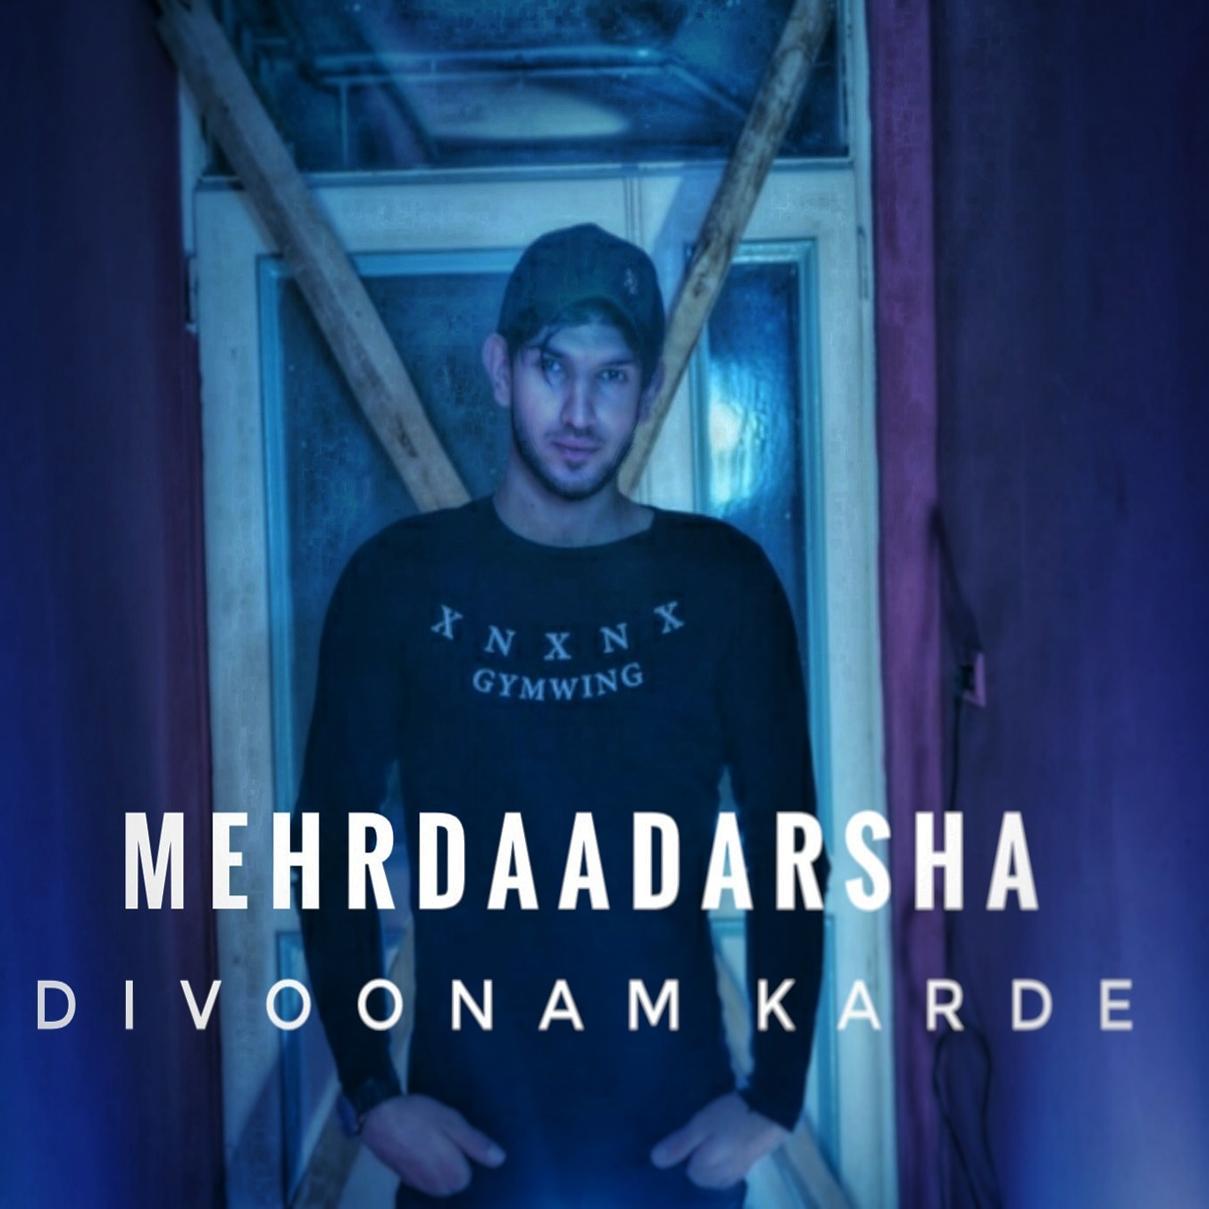 Mehrdaad Arsha – Divoonam Karde